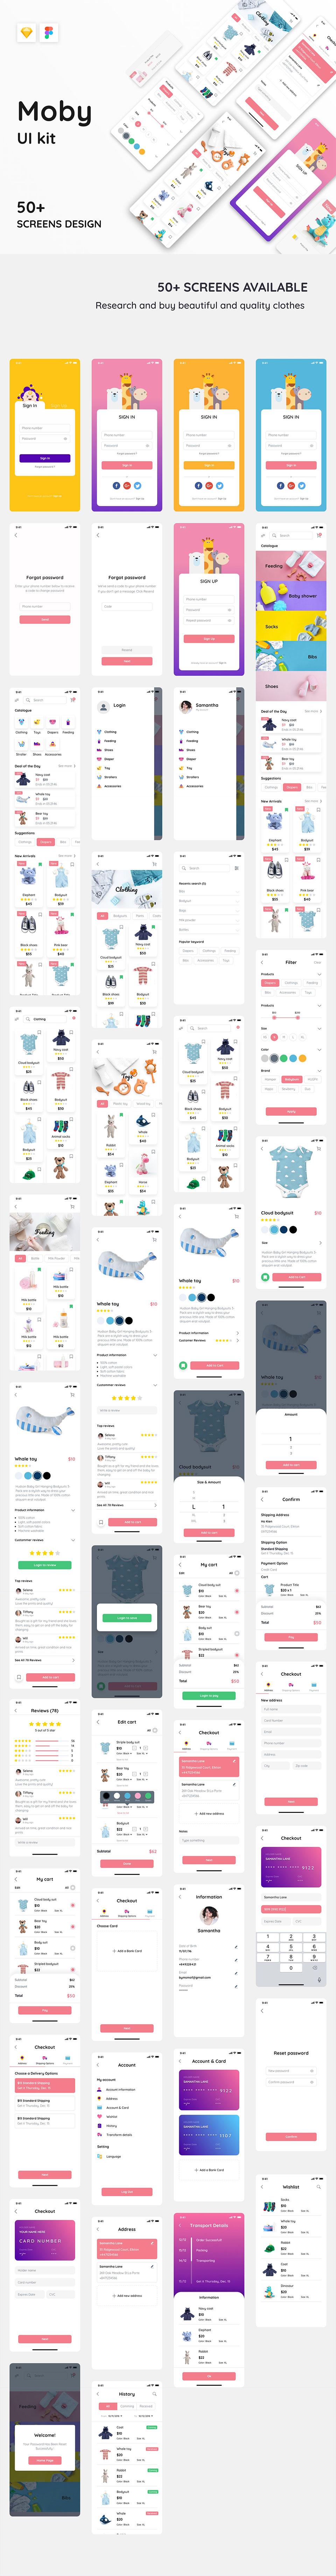 完美的母婴类电商 APP UI KIT 套装模板下载 [Sketch,Fig] Moby E-commerce App Ui Kit